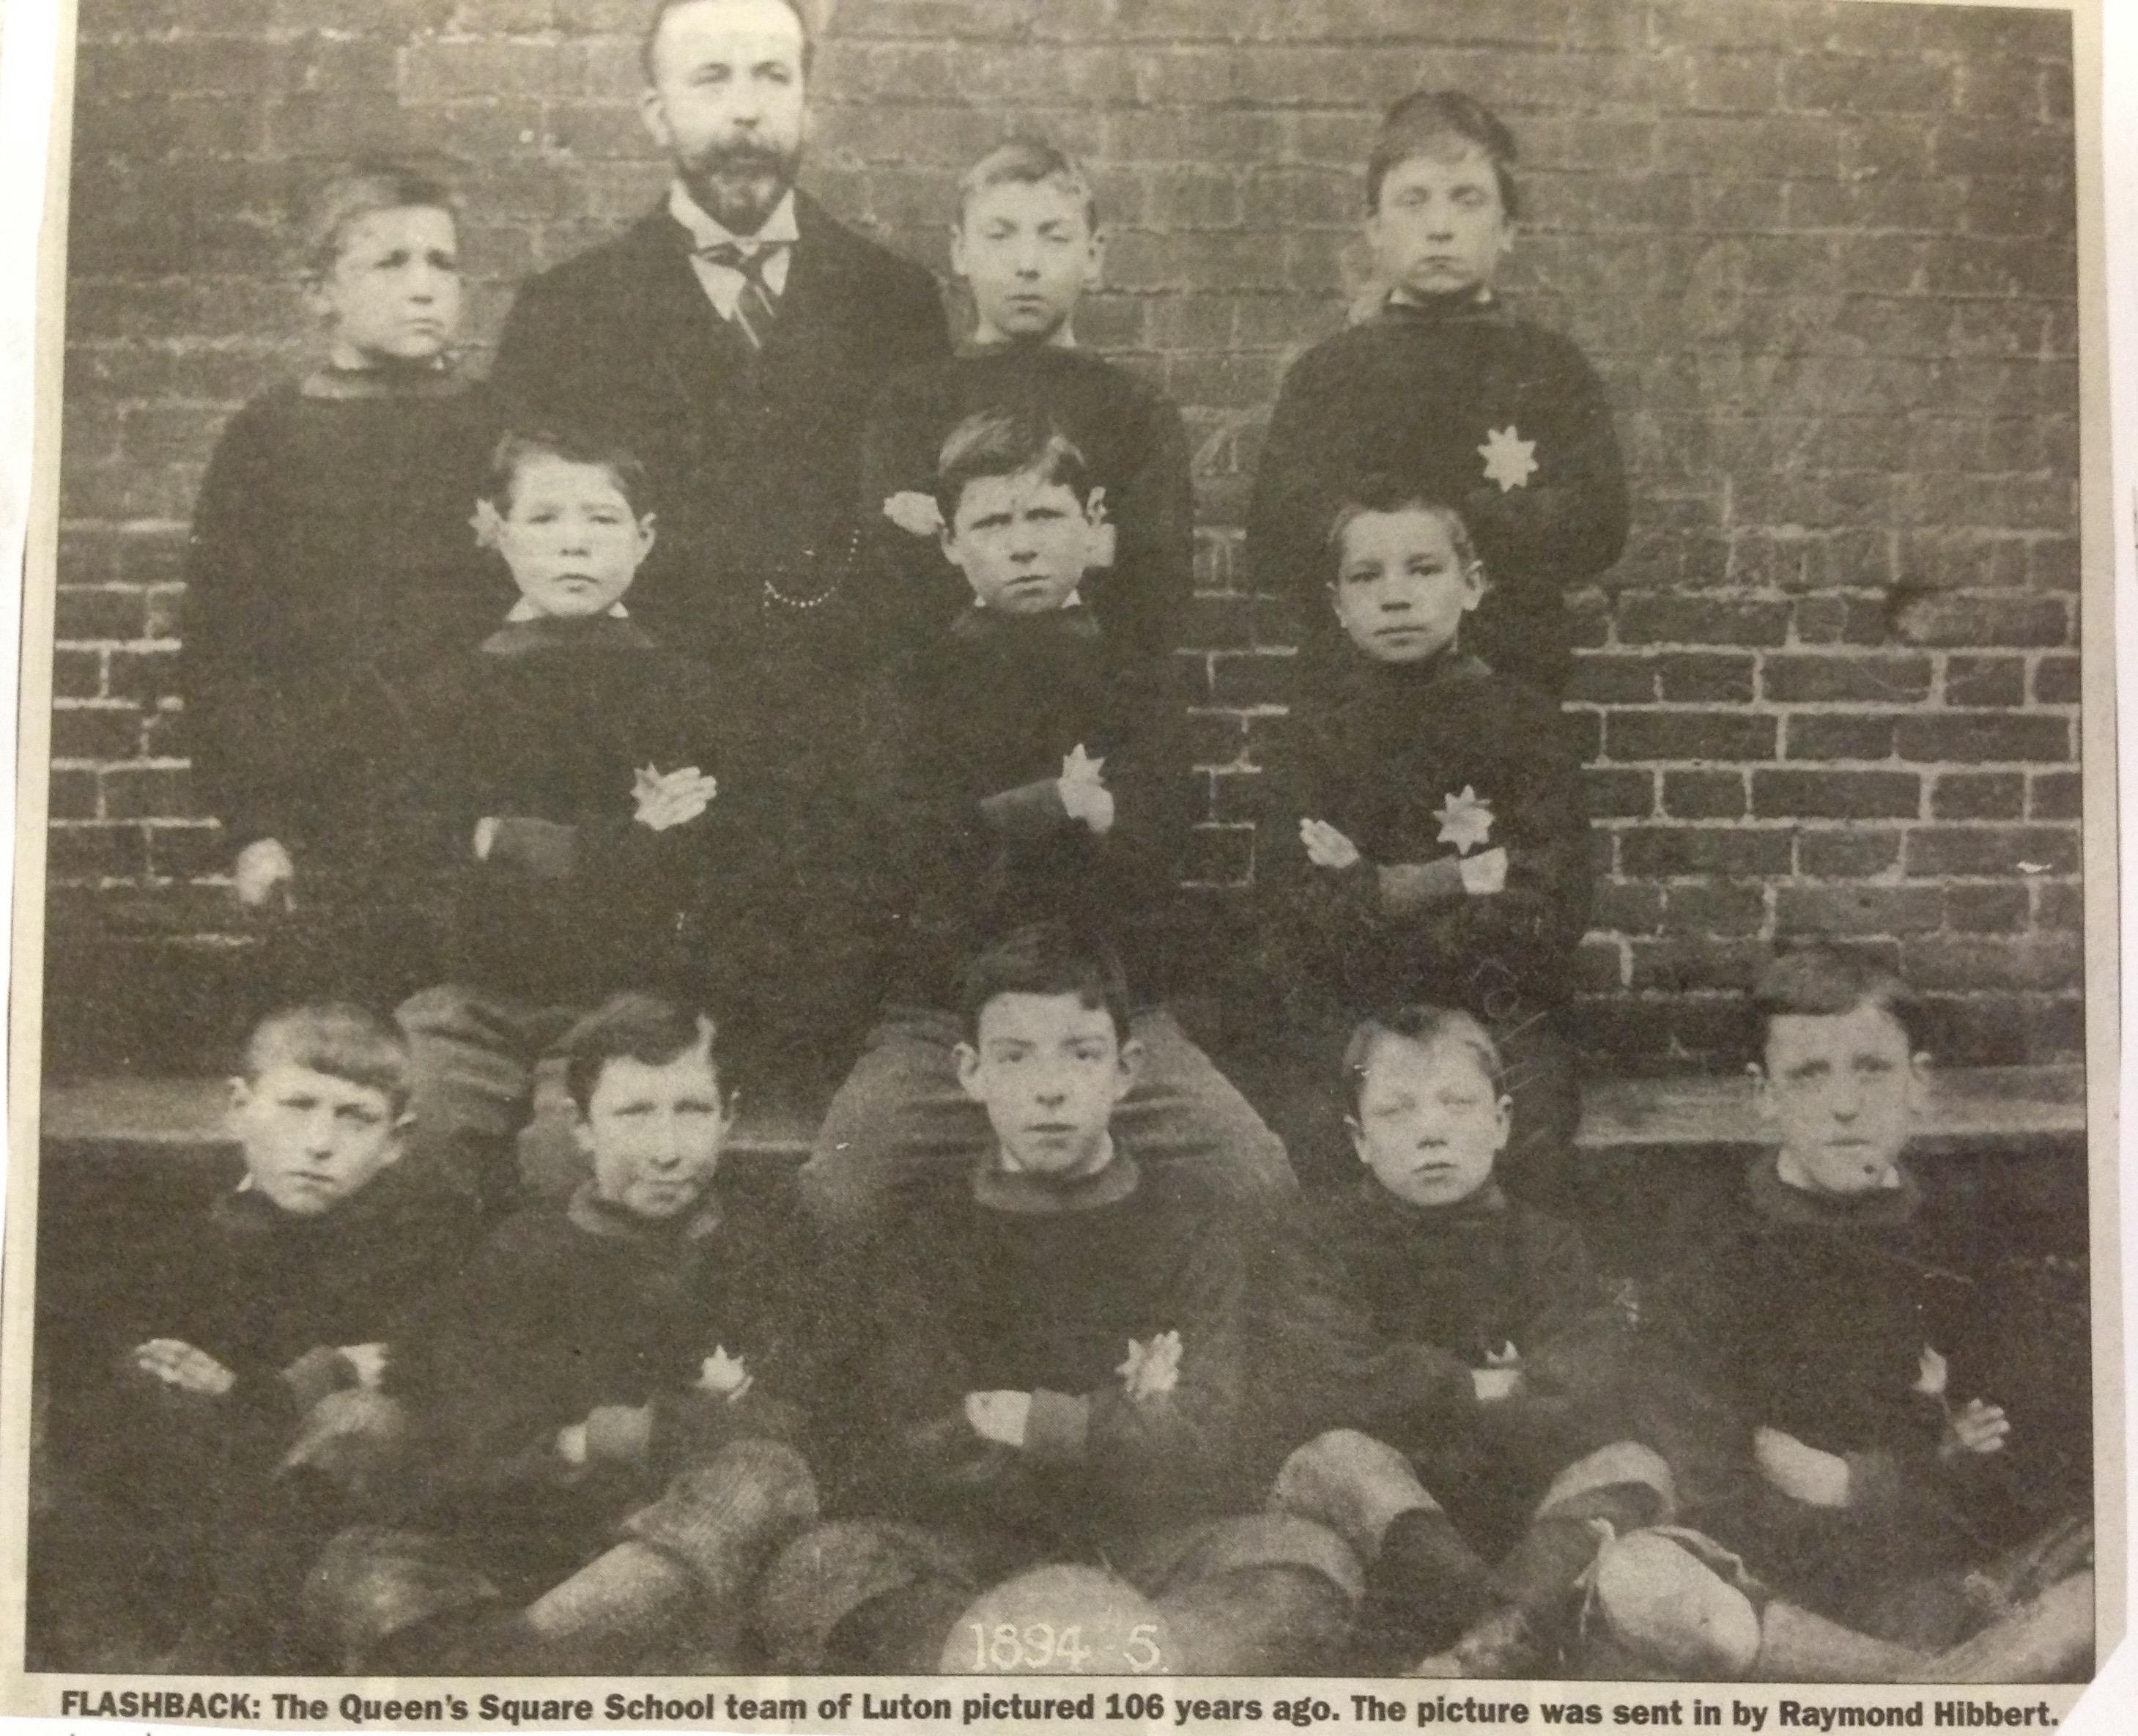 Queen's Square School, Luton, football team 194:95